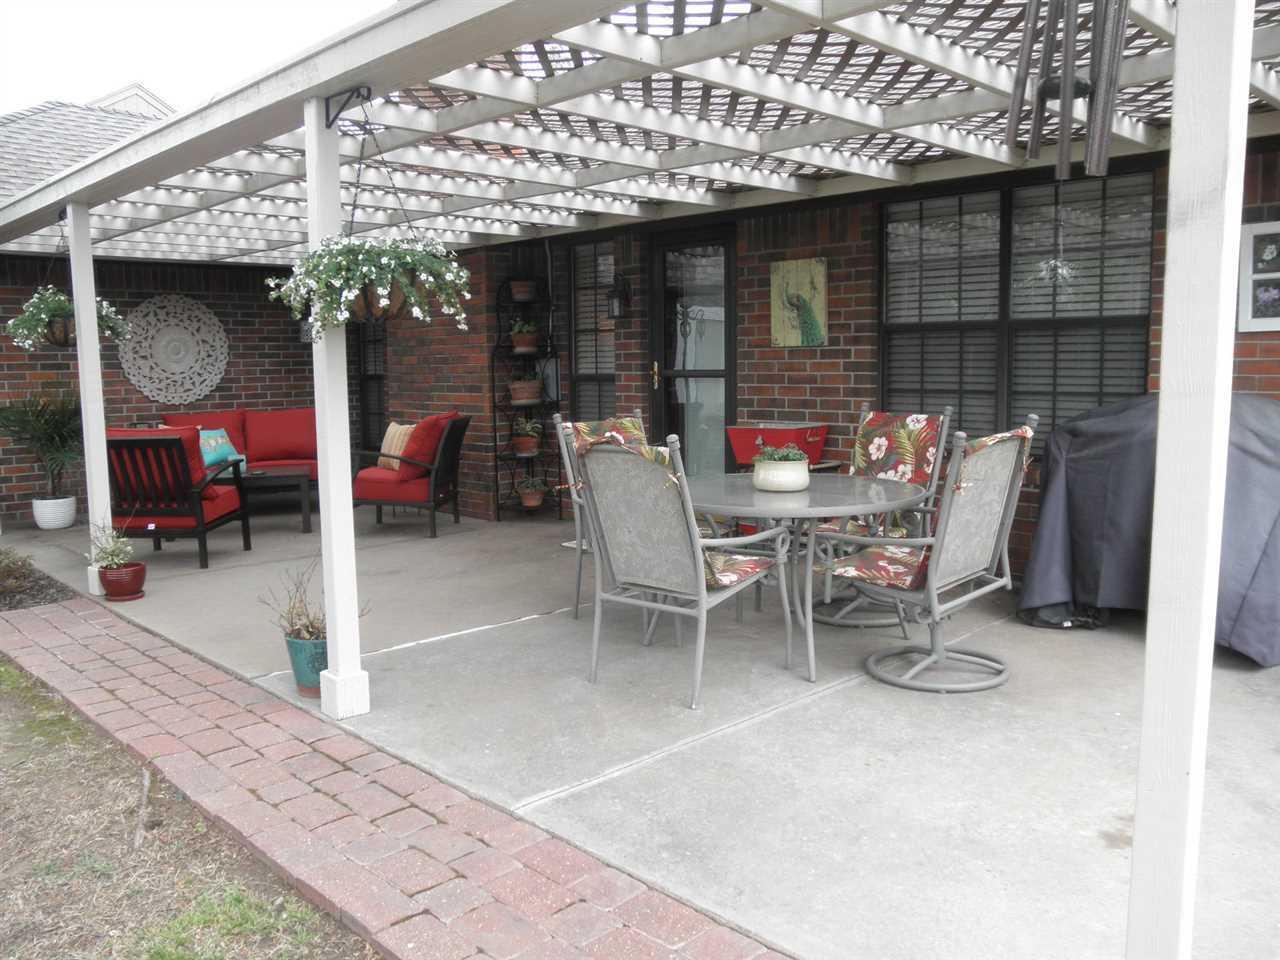 Sold Intraoffice W/MLS | 2800 Green Meadow Ponca City, OK 74604 27